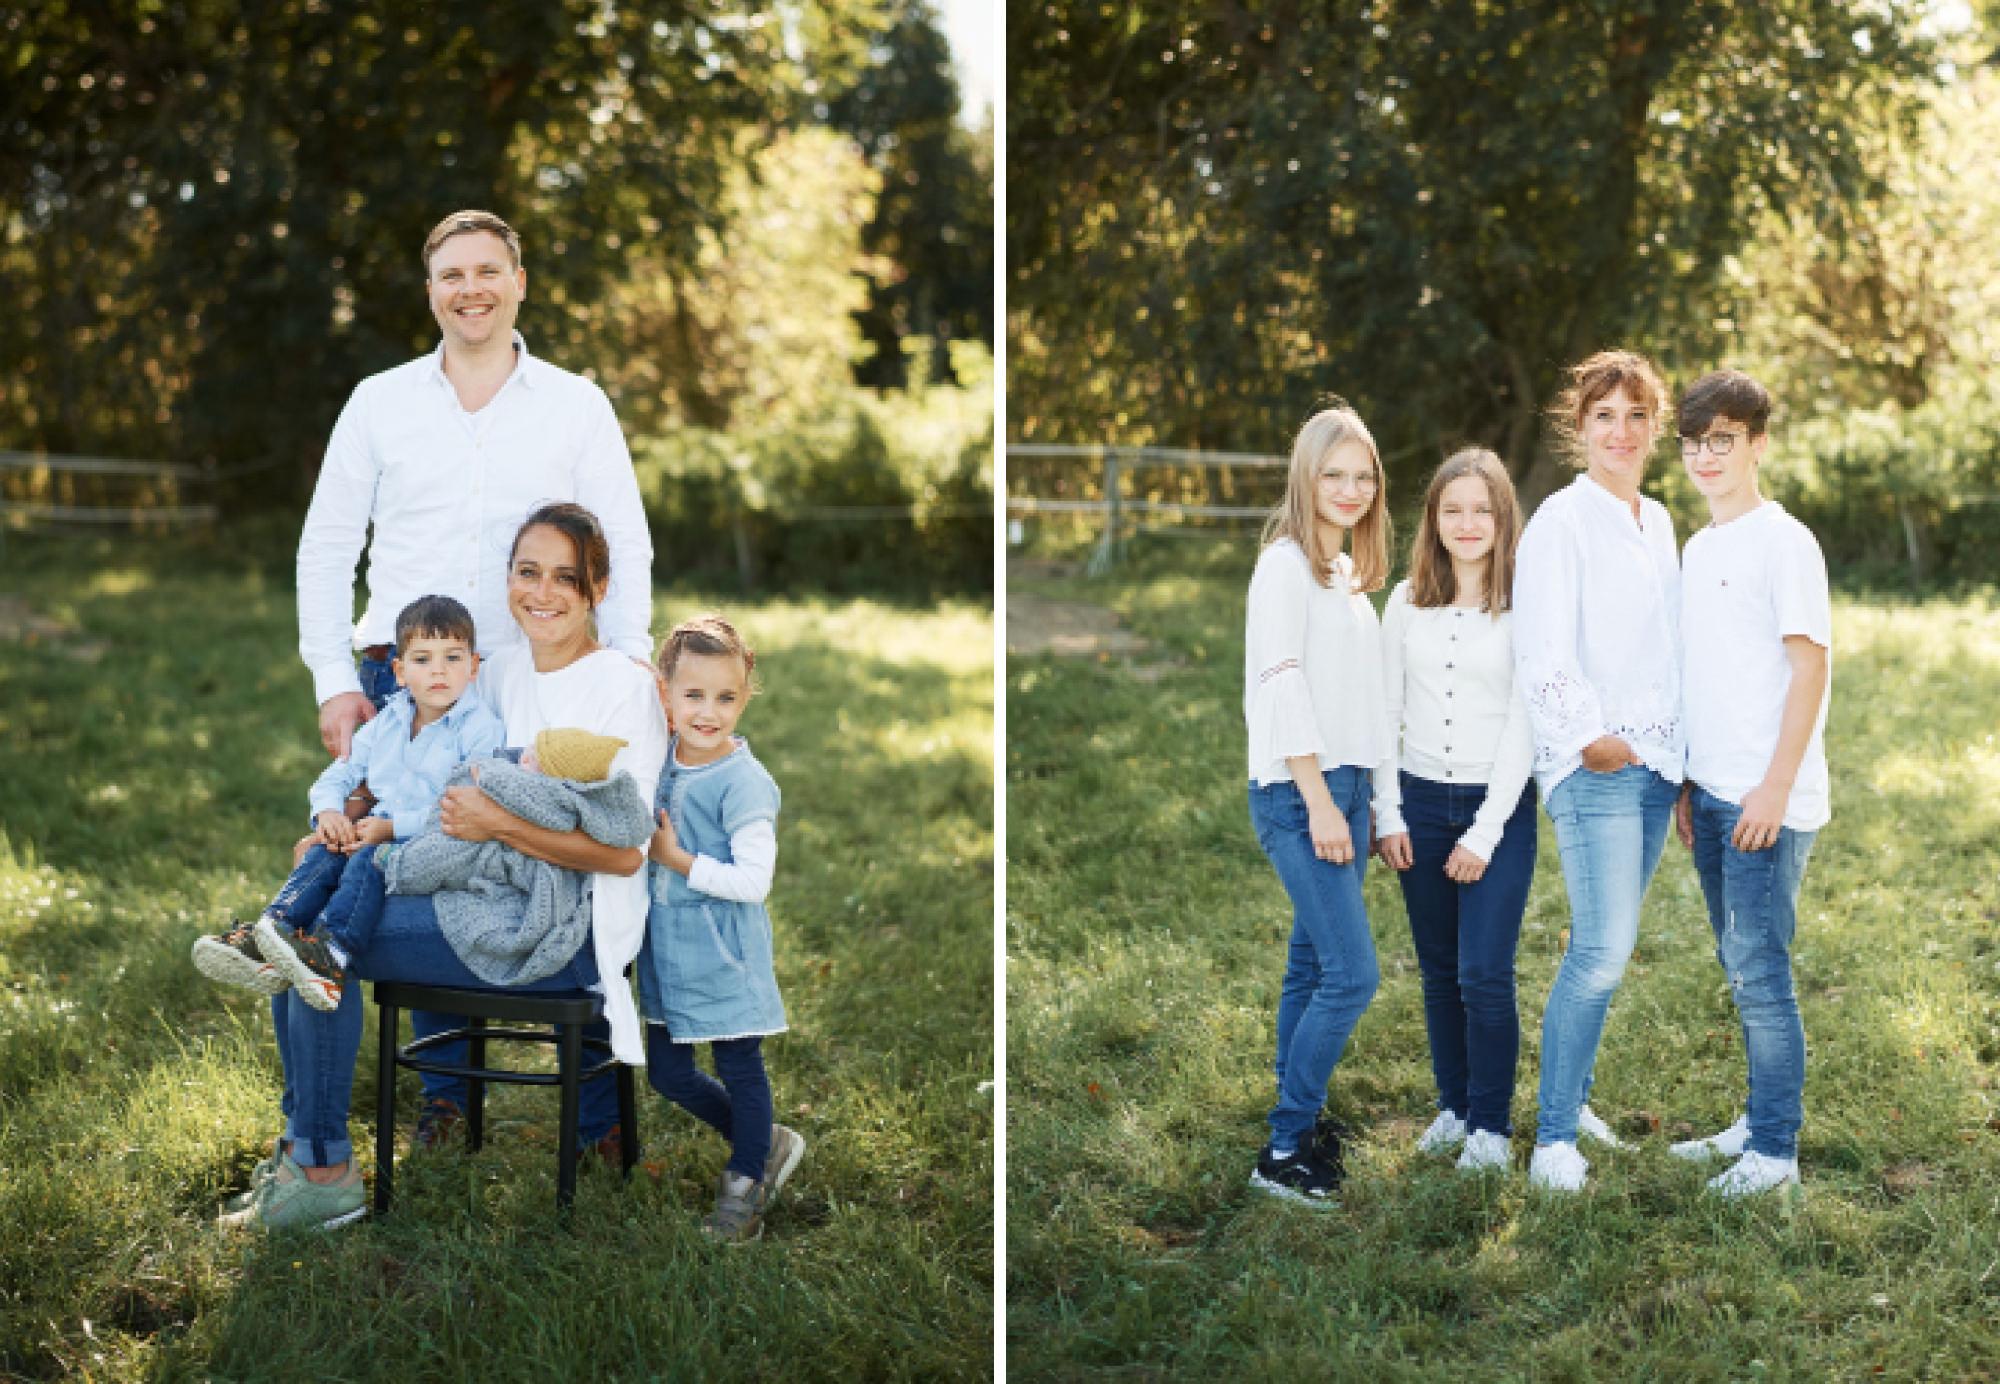 Familienfotos Fotograf Augsburg 0007